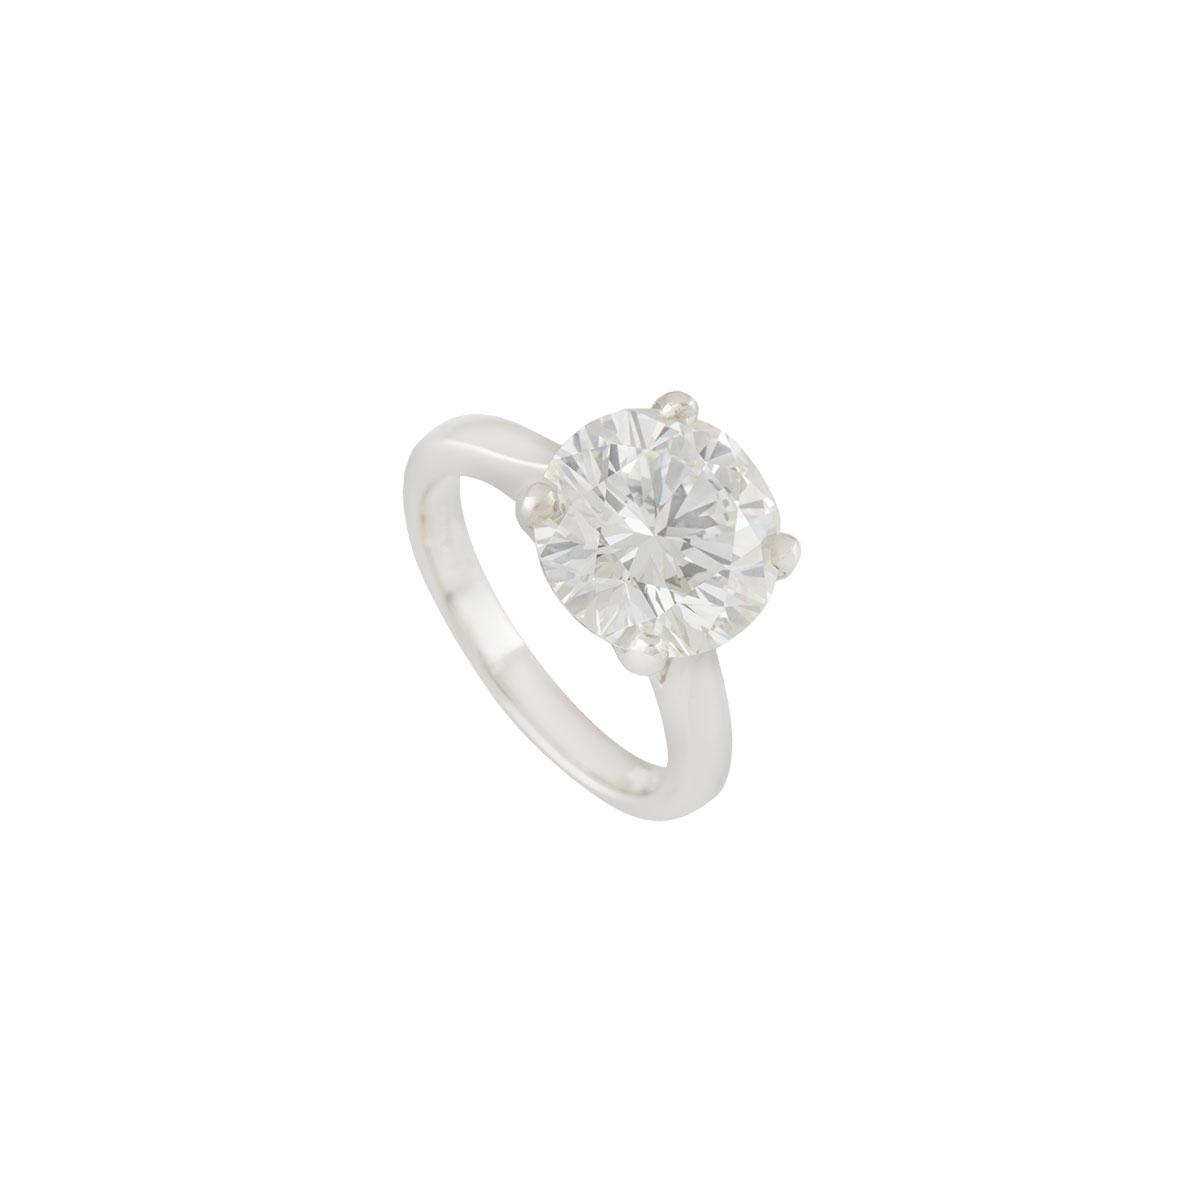 Platinum Diamond Ring 5.01ct J/VVS2